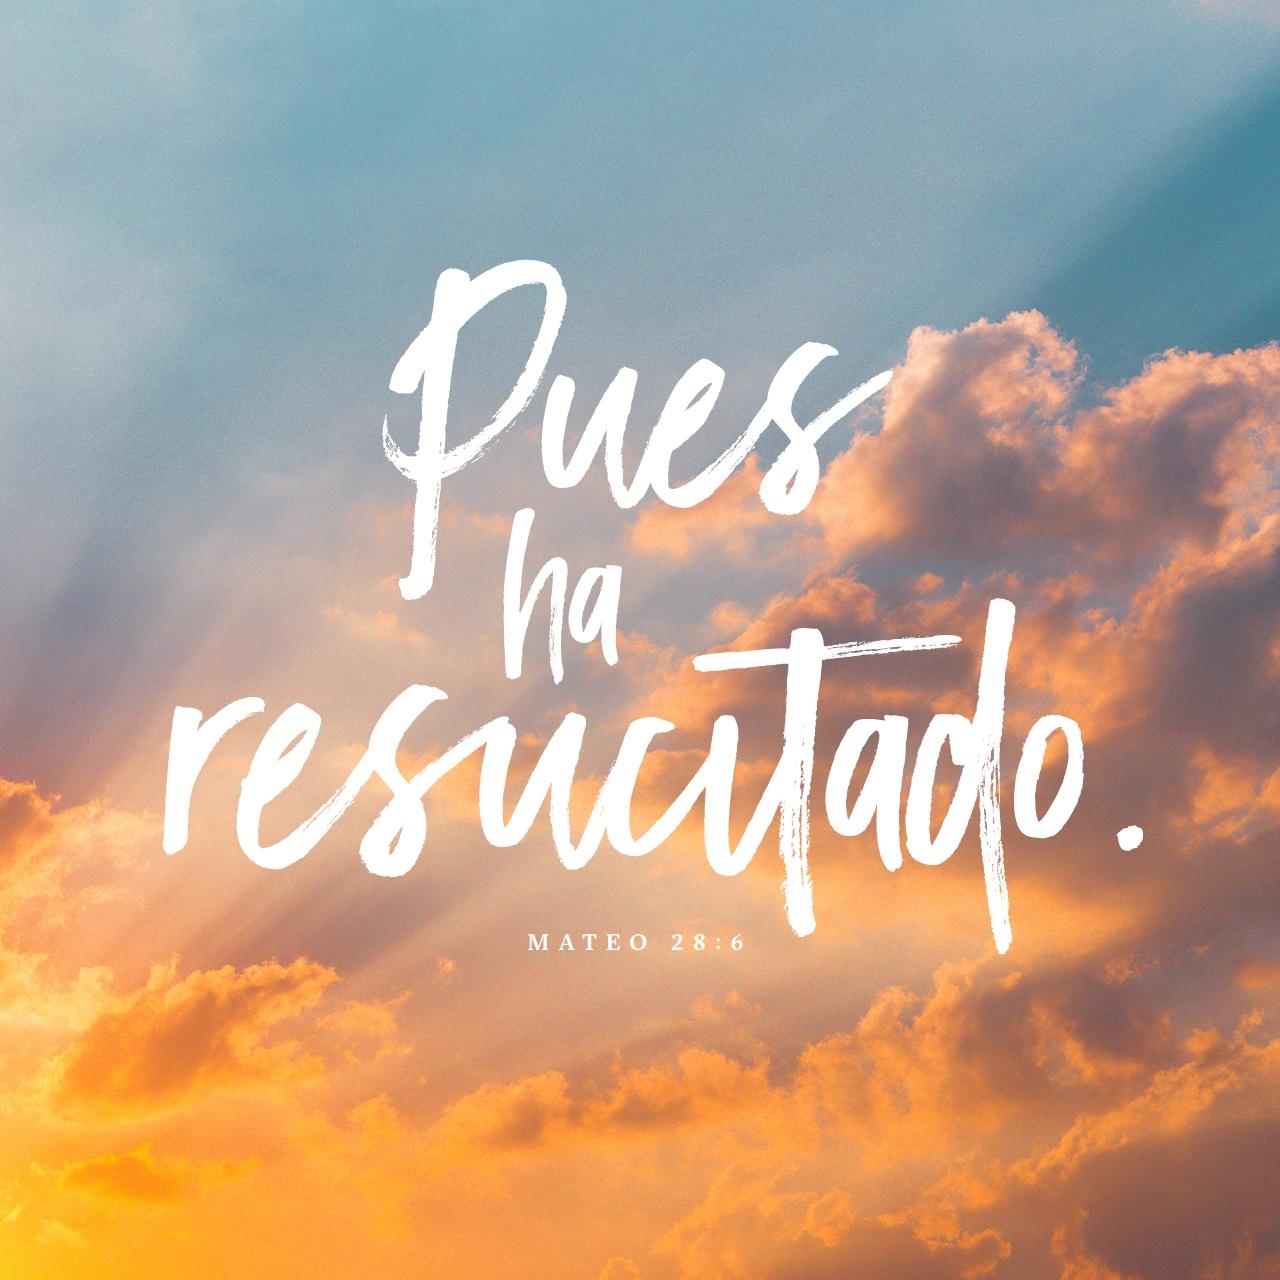 Mateo 28:6 Imagen de Versículo